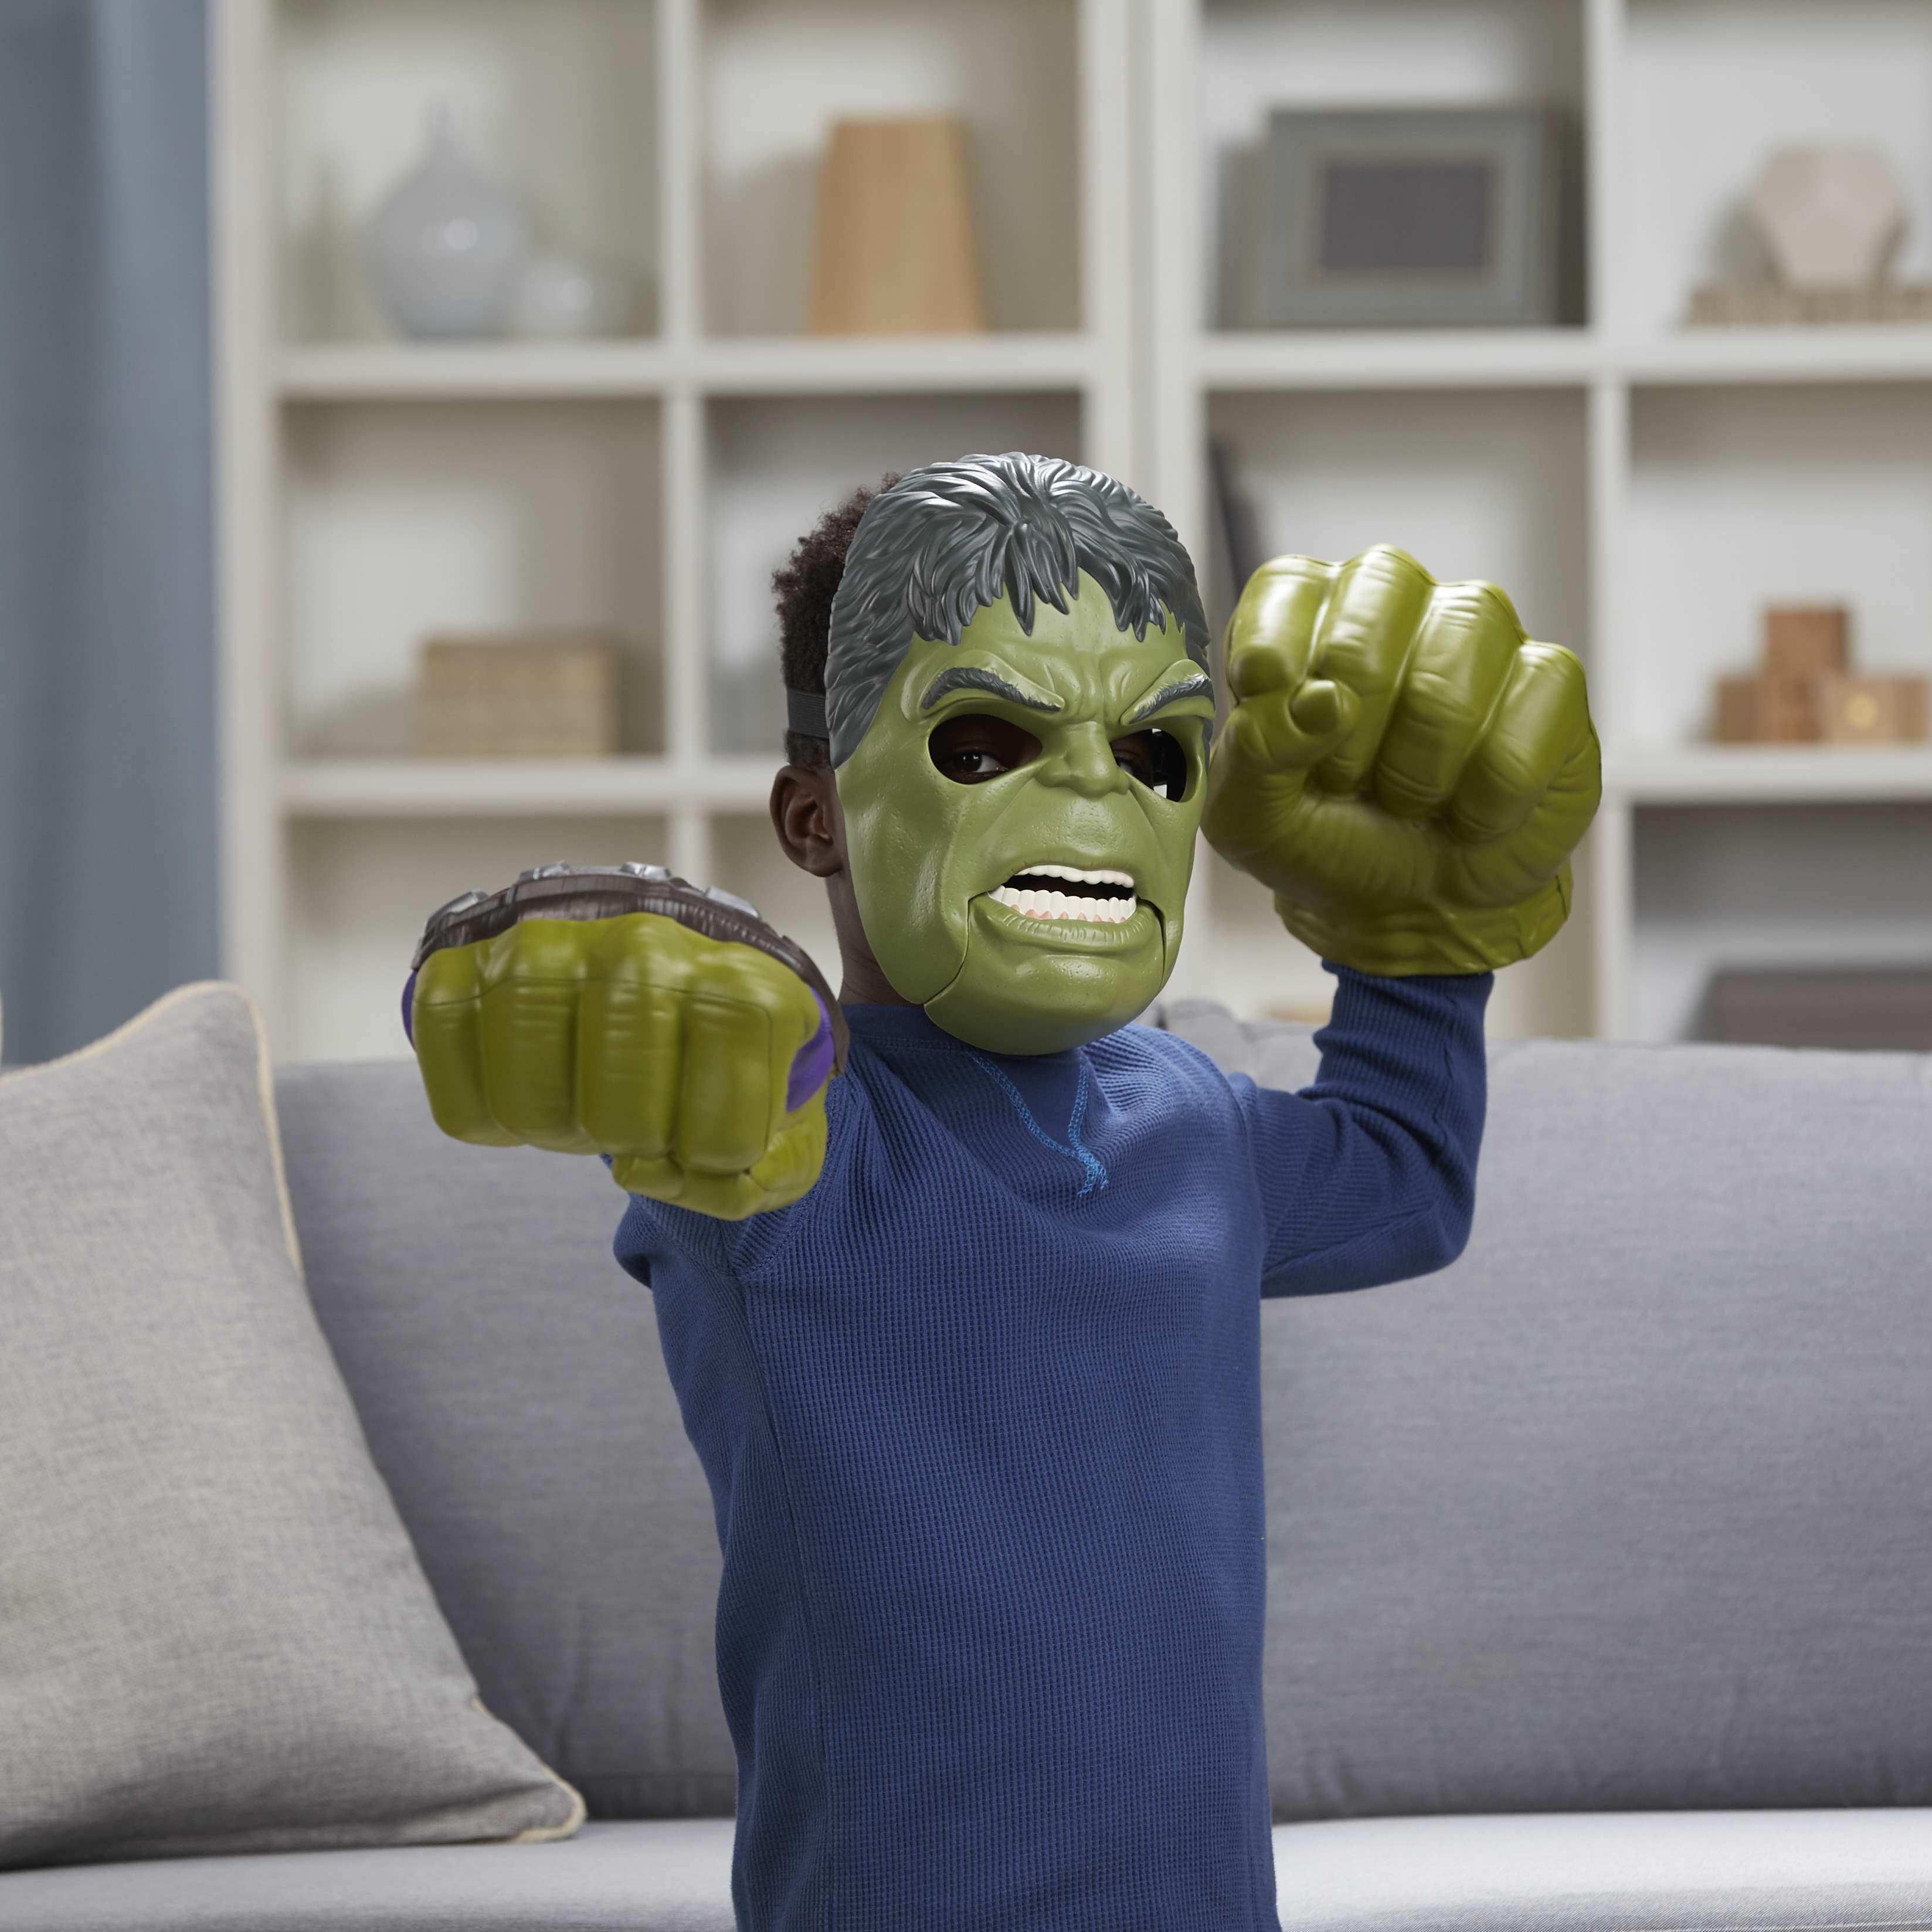 Thor e Hulk: tornano film e giochi